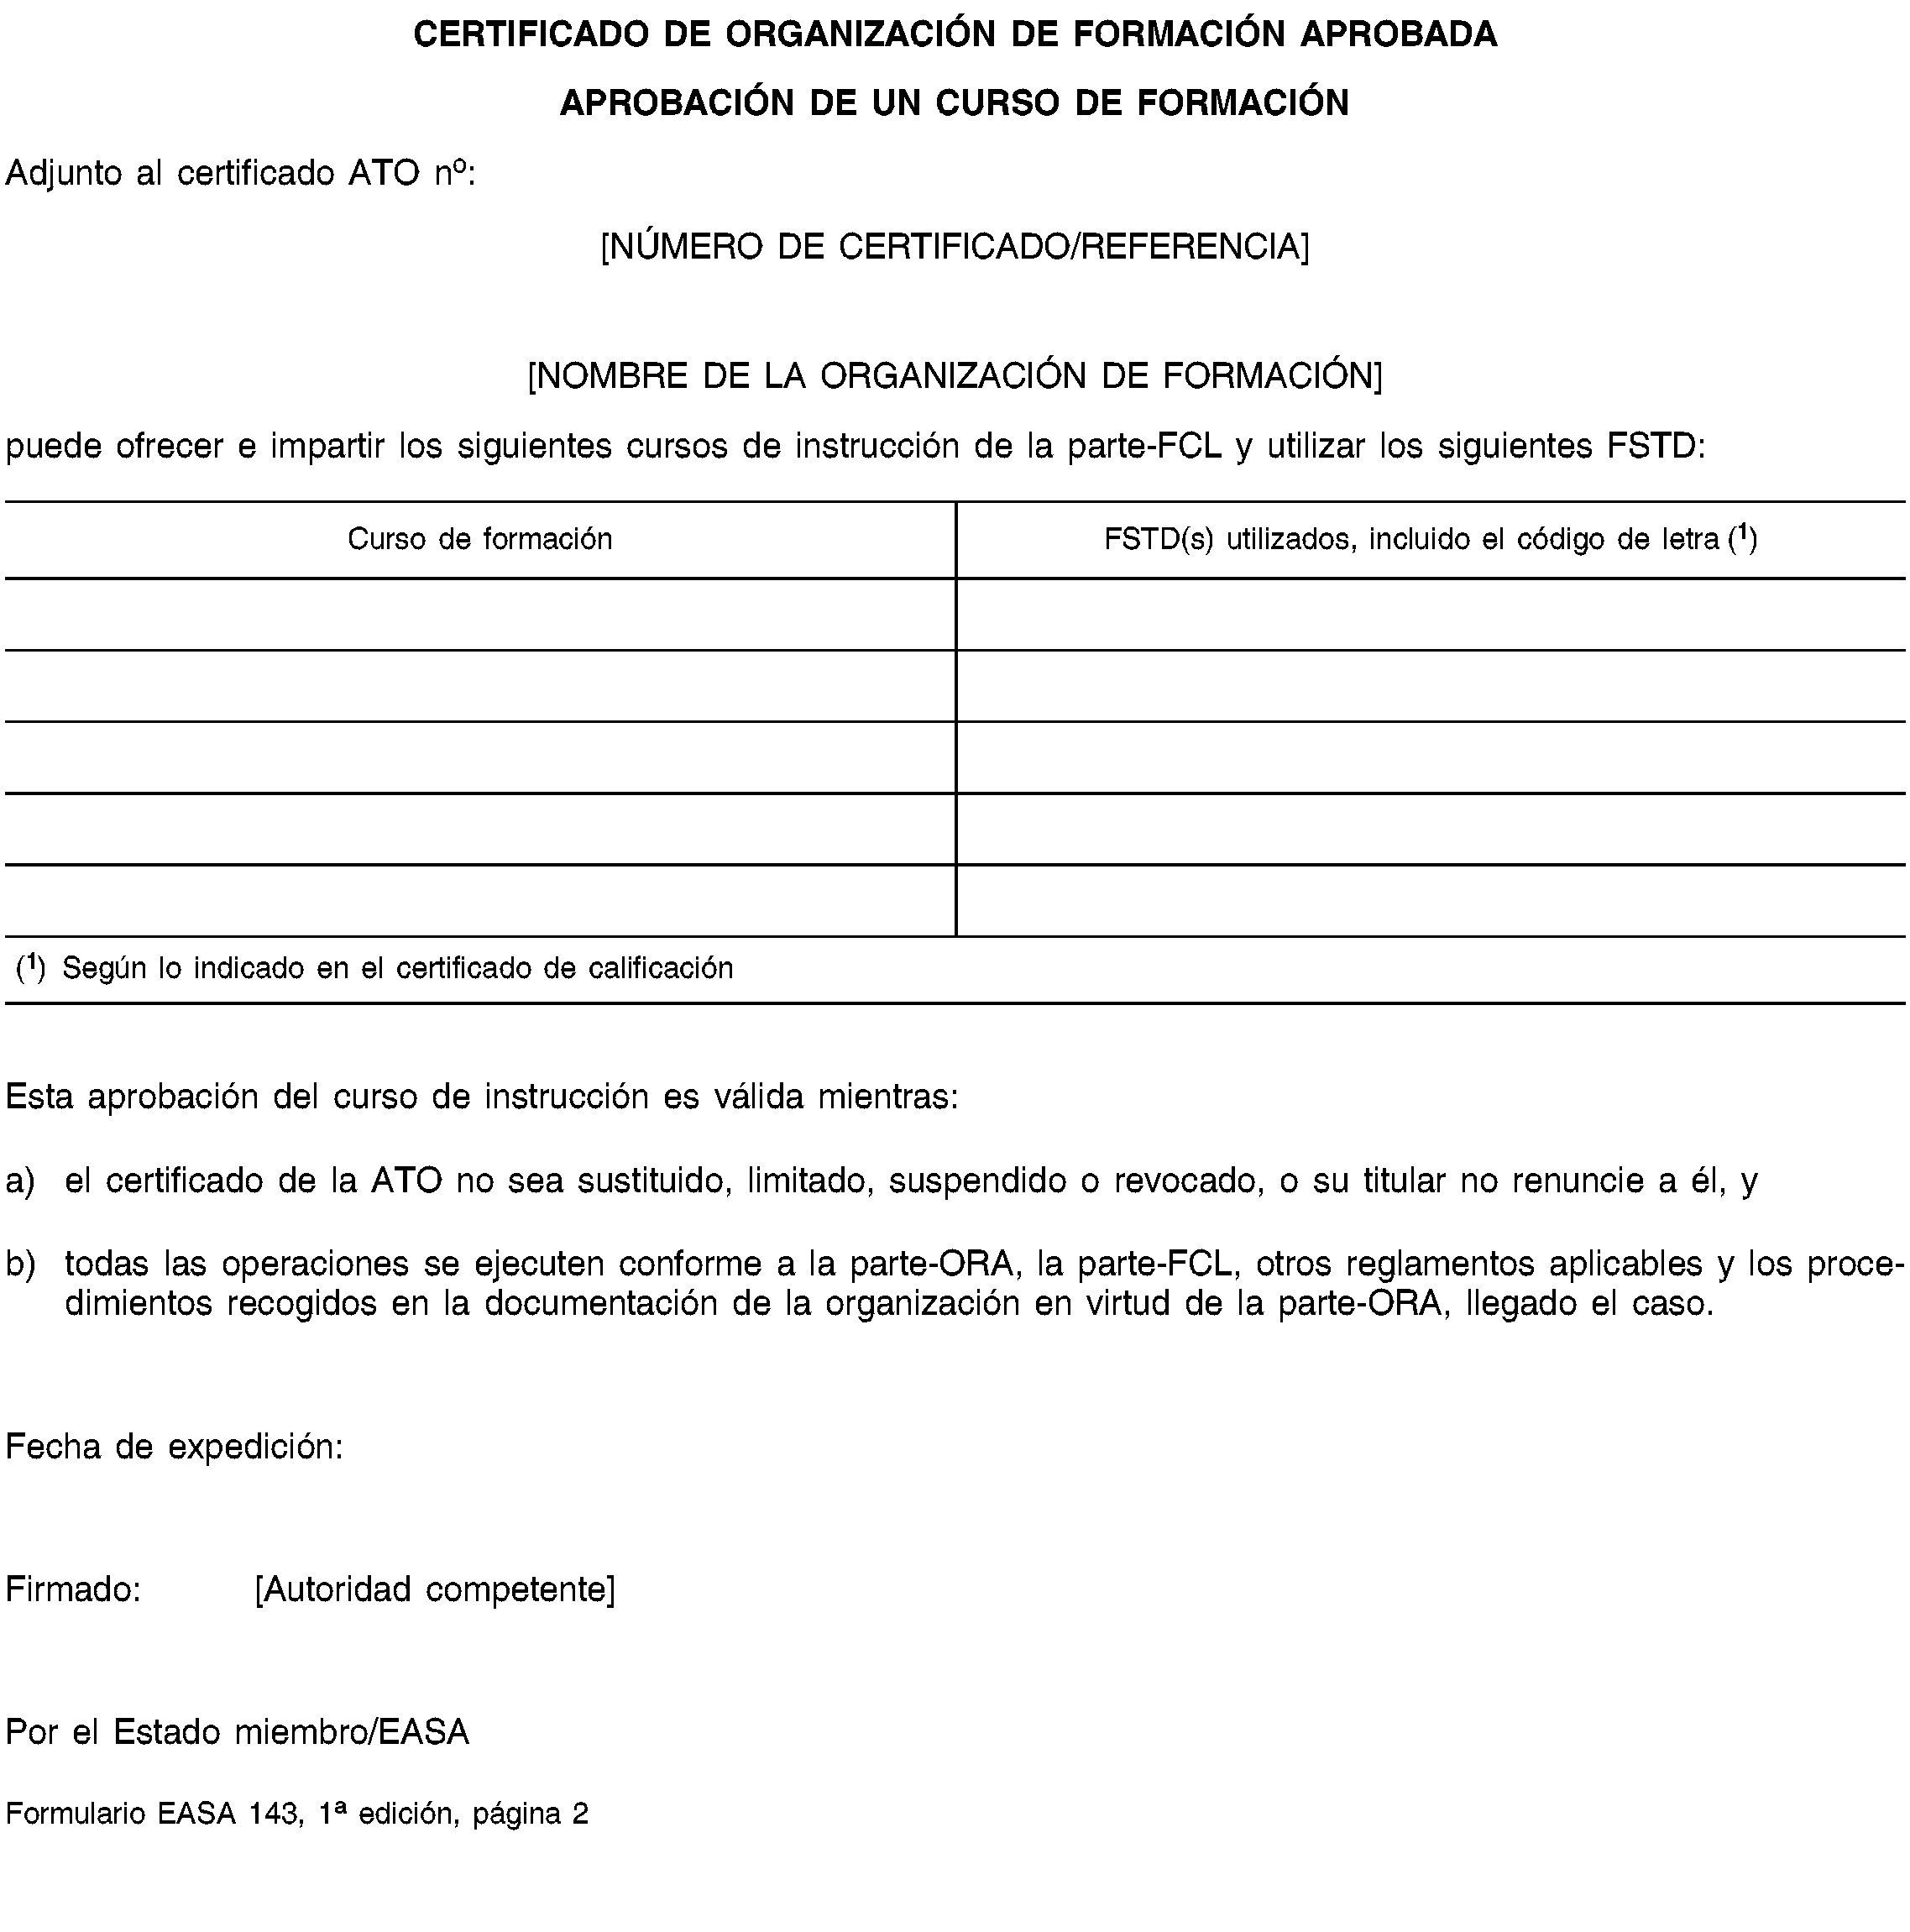 EUR-Lex - 02011R1178-20160408 - EN - EUR-Lex